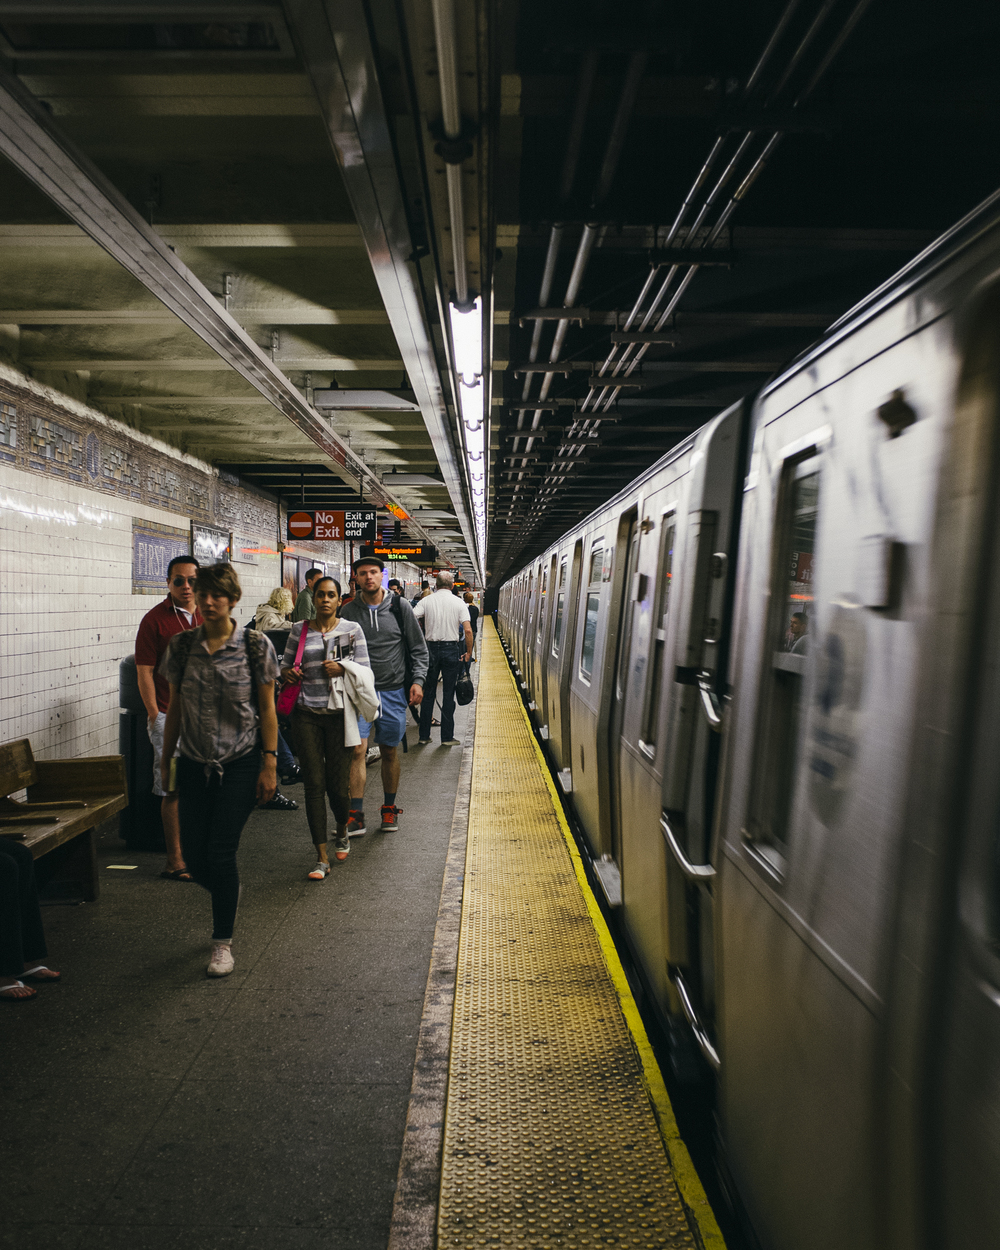 1st Avenue Station, East Village, Manhattan; September 2014